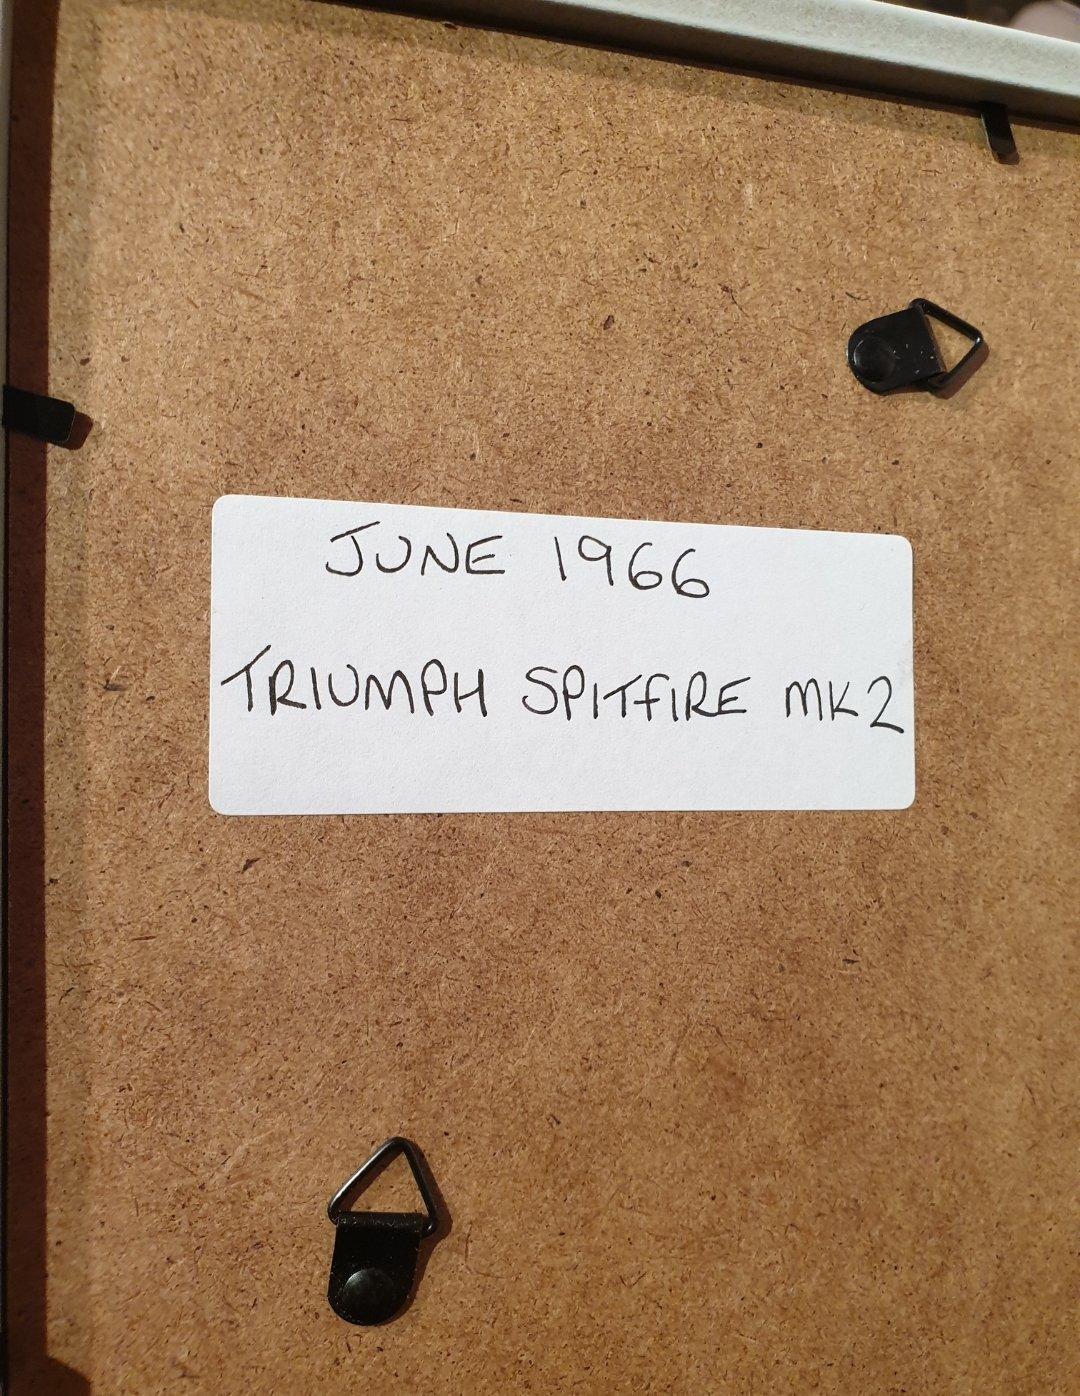 Original 1966 Triumph Spitfire Framed Advert For Sale (picture 2 of 3)